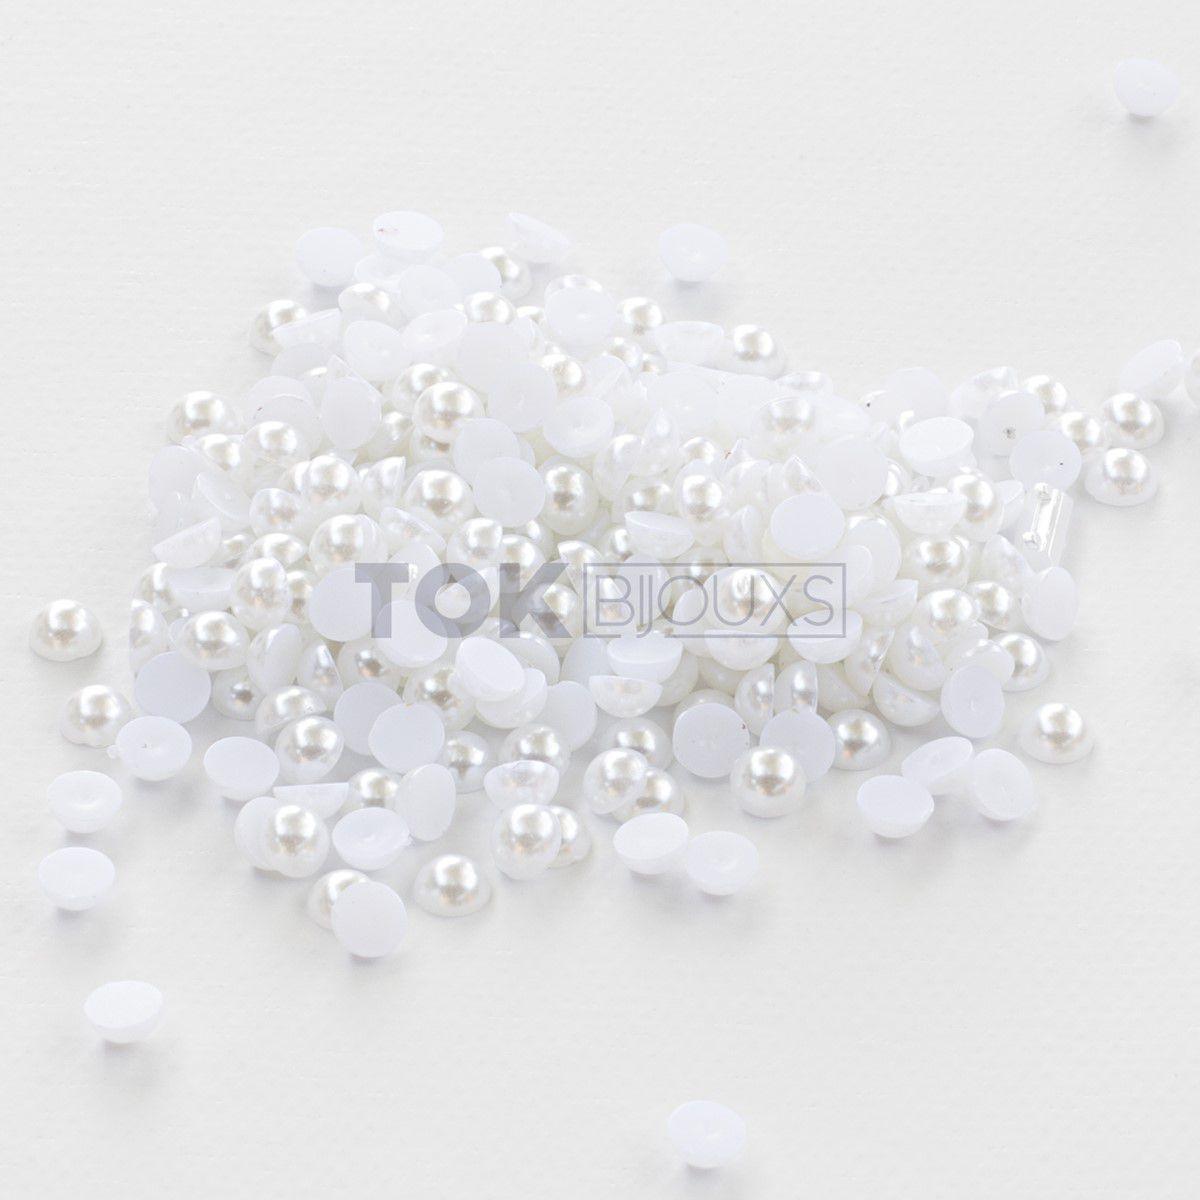 Micro Meia Pérola Abs 3mm - Branco - 25g